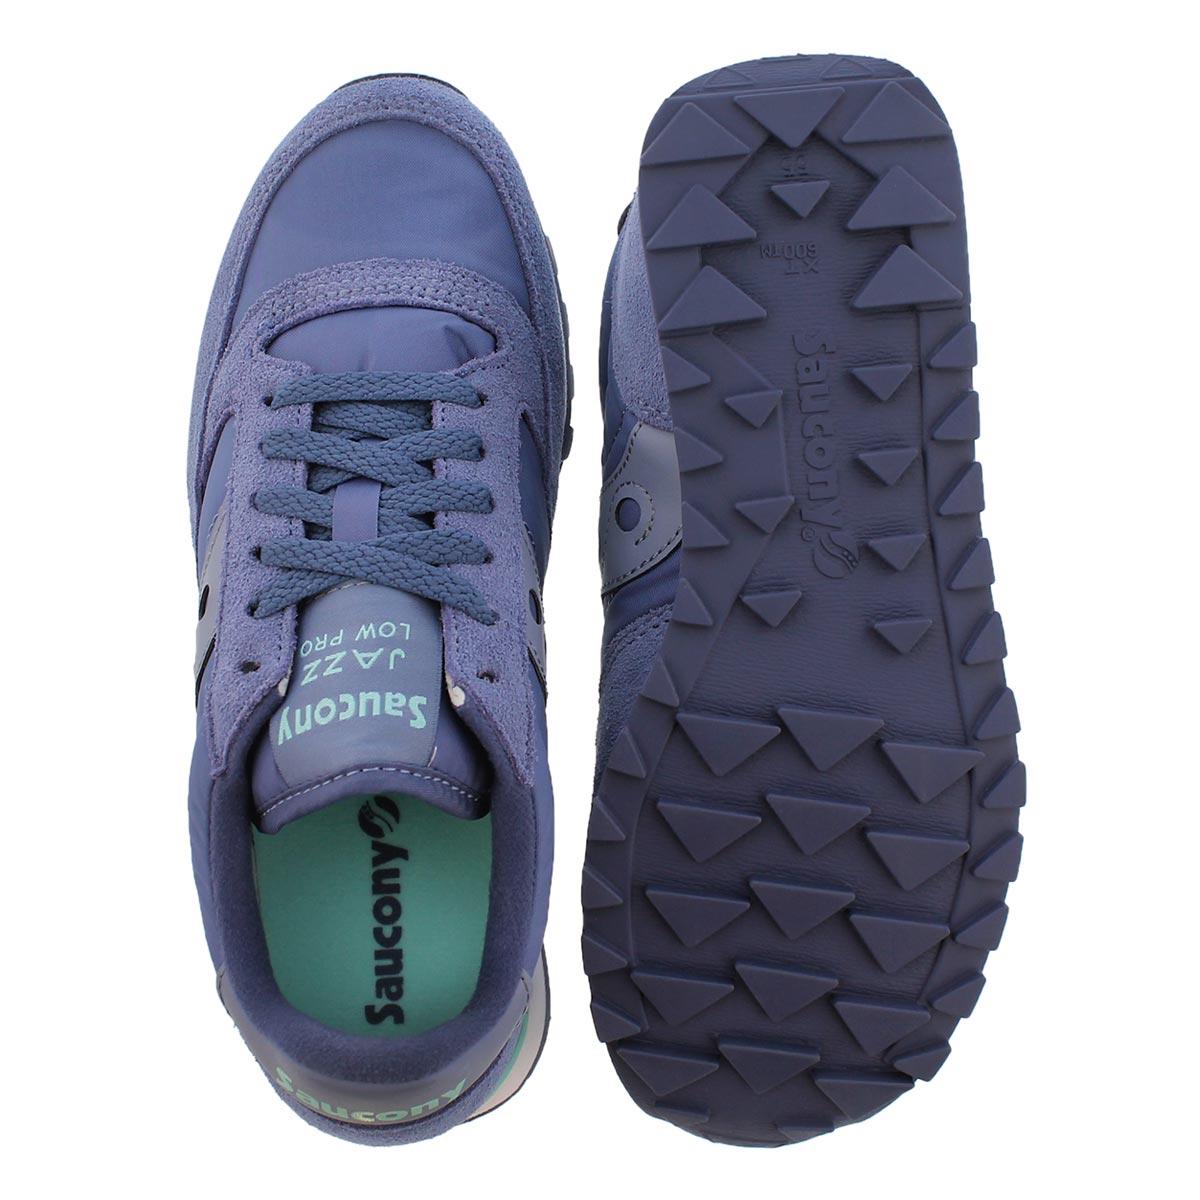 Lds Jazz Low Pro ppl lace up sneaker